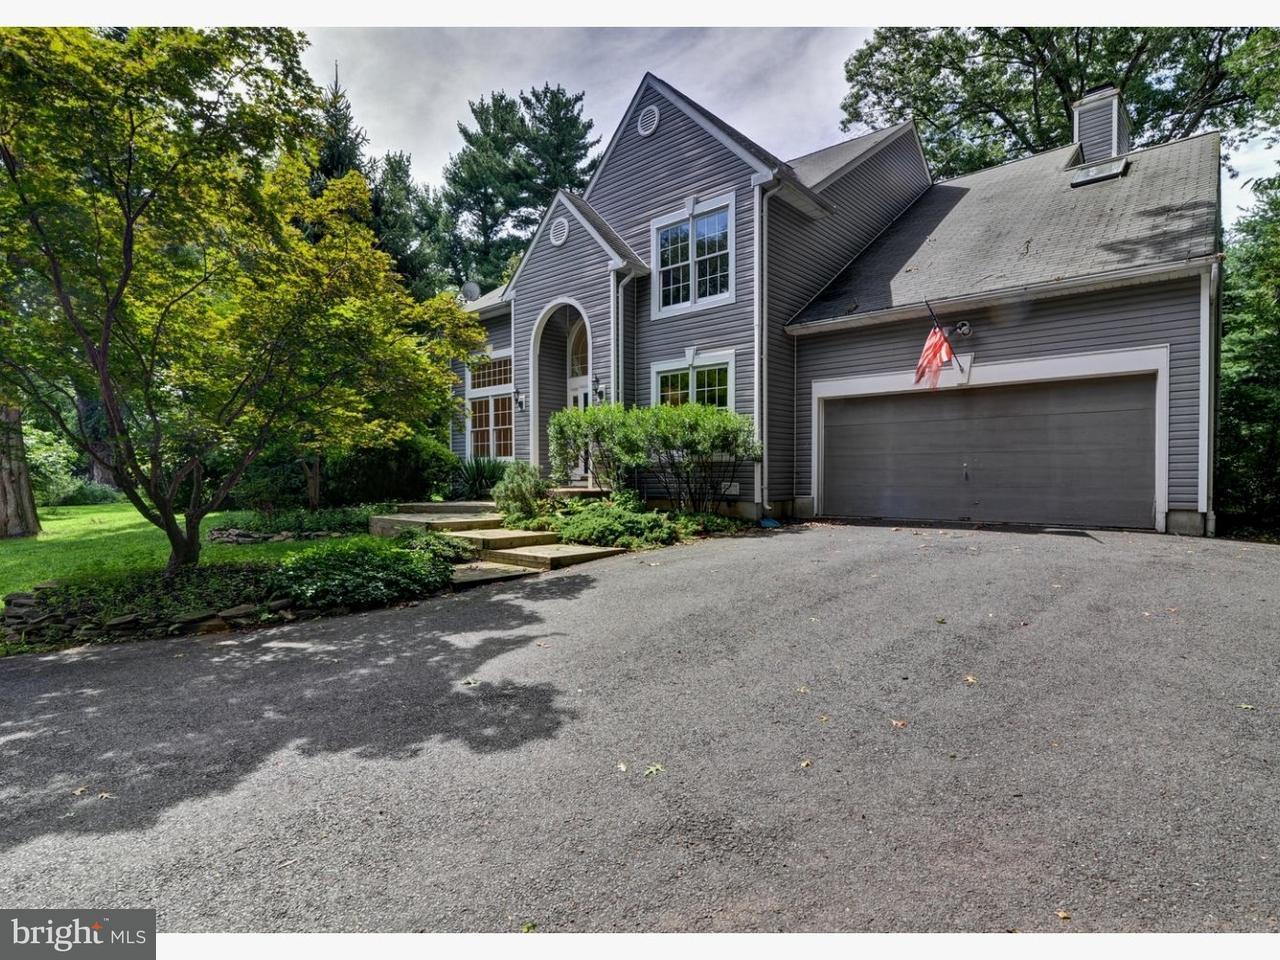 Single Family Home for Rent at 149 E DELAWARE Avenue Pennington, New Jersey 08534 United StatesMunicipality: Pennington Borough